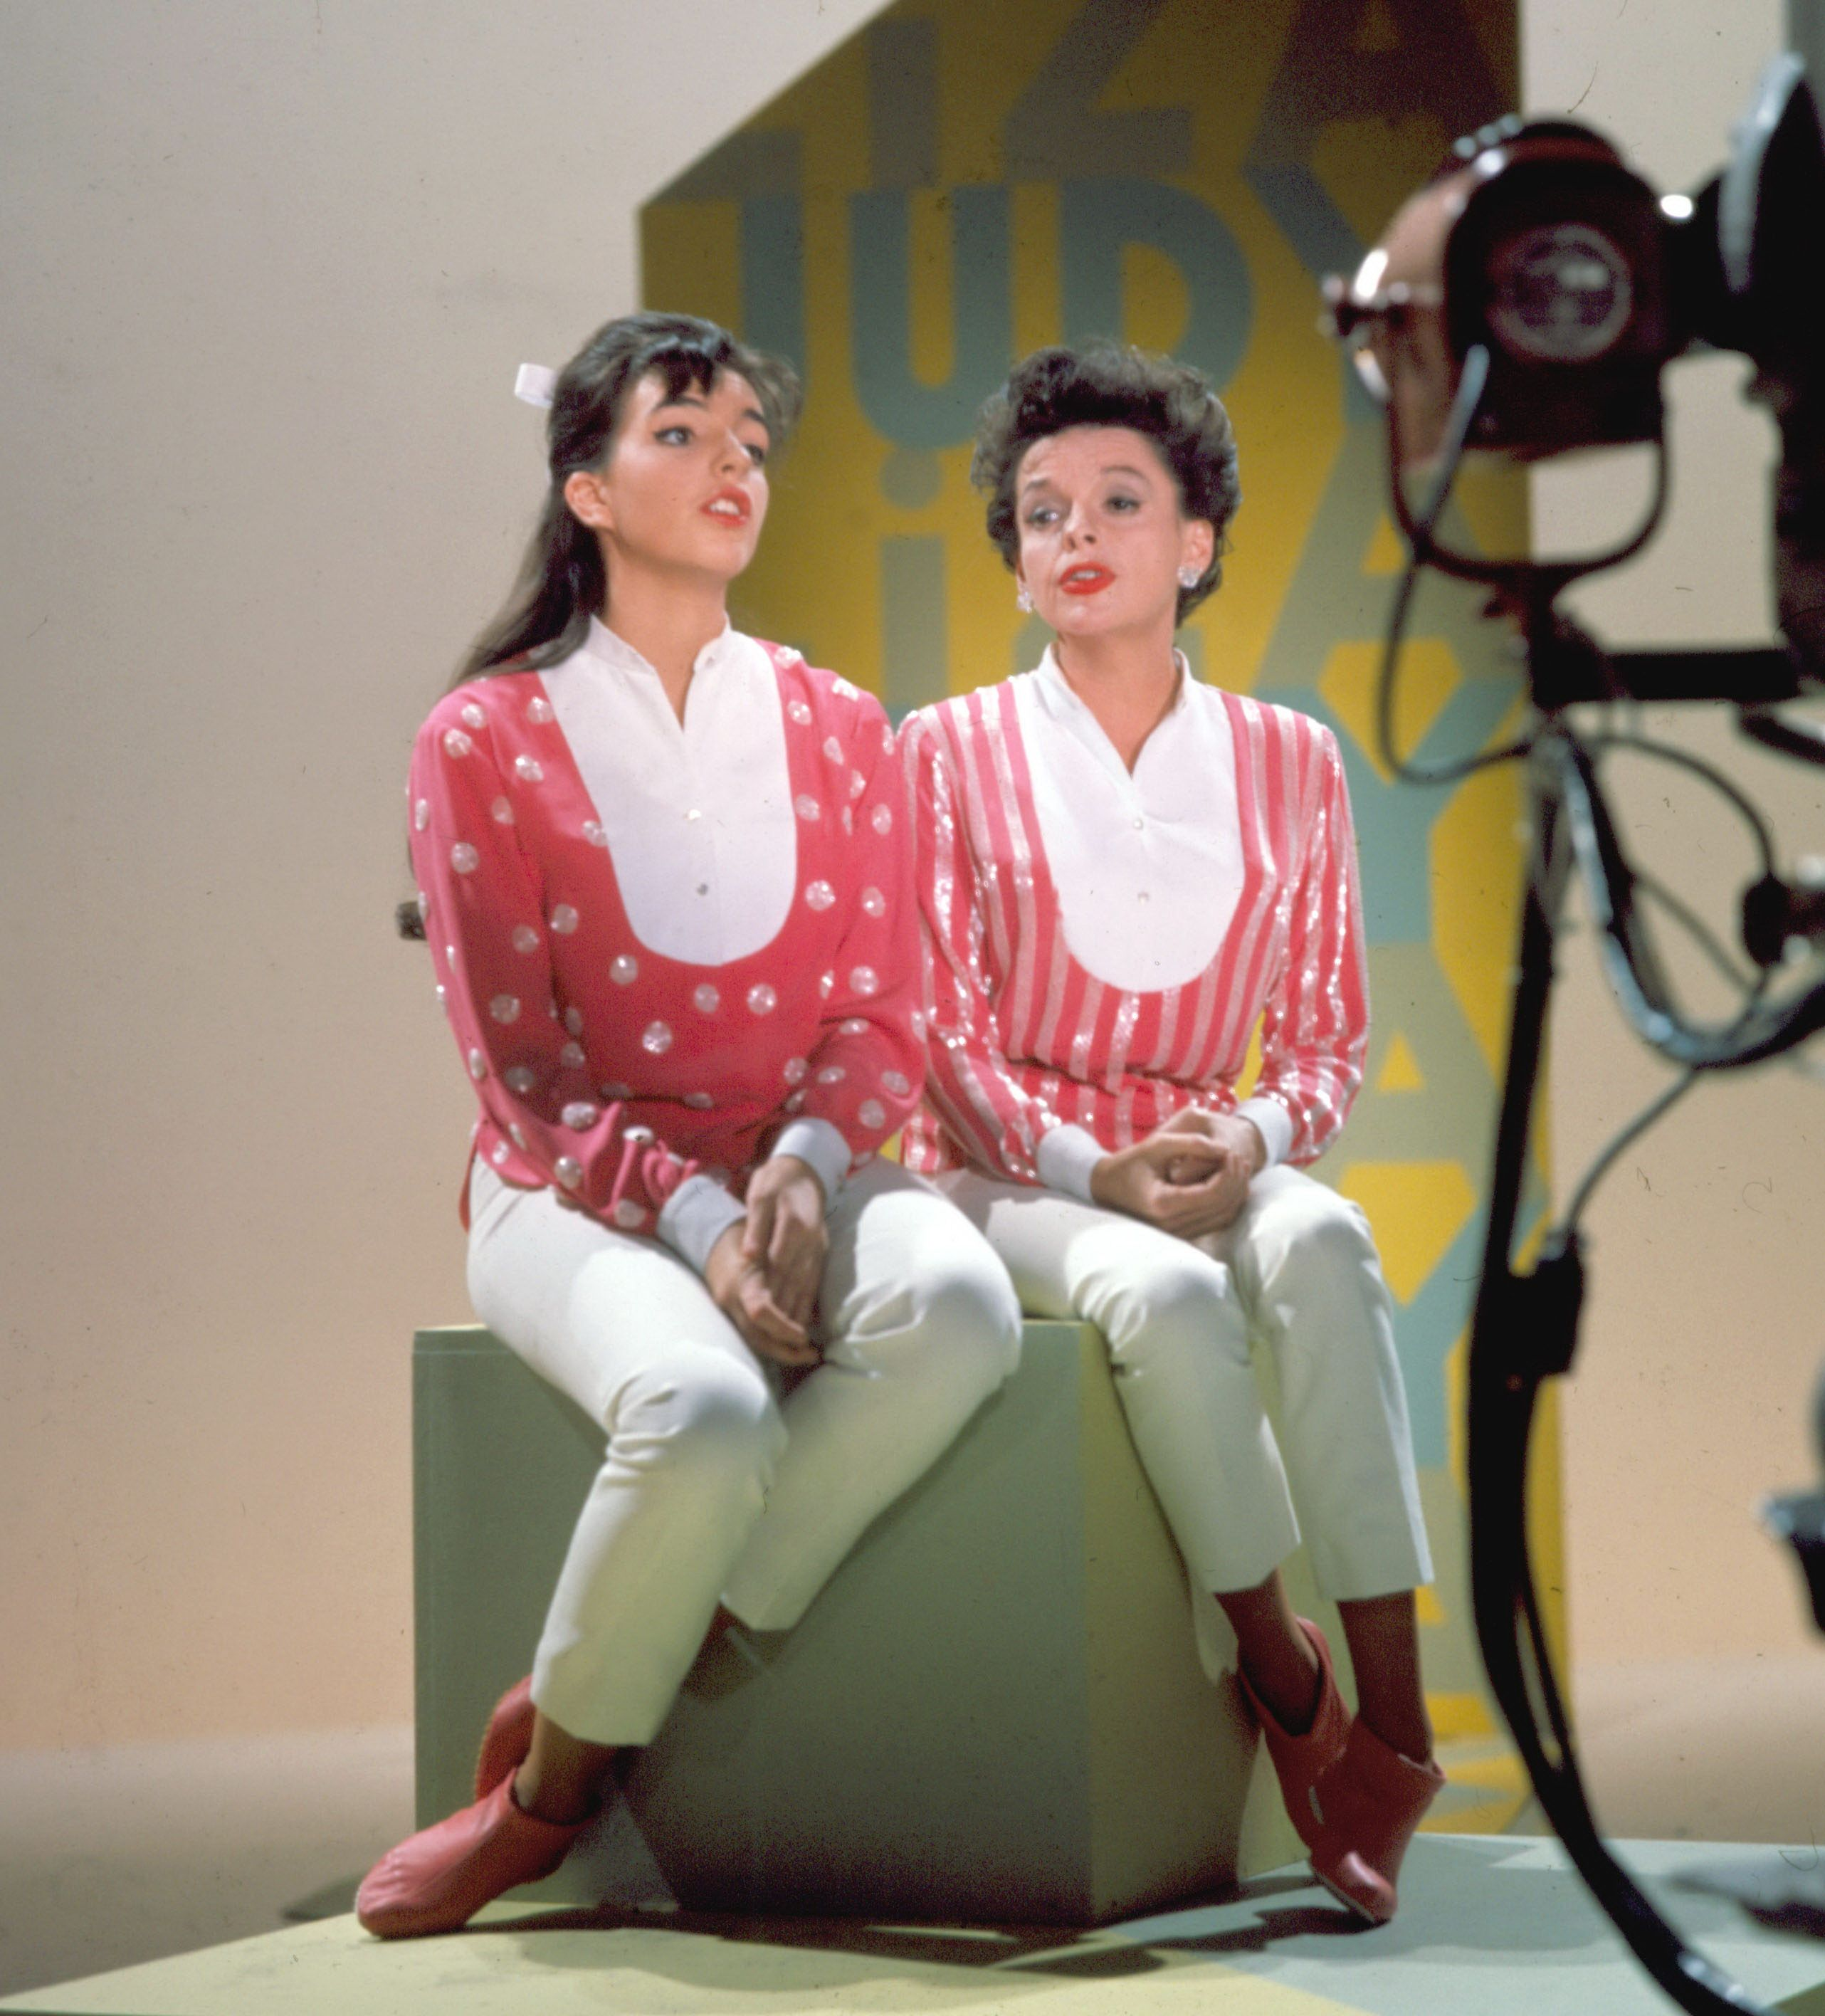 Liza Minnelli Talks About Mother Judy Garland Renee Zellweger S Judy